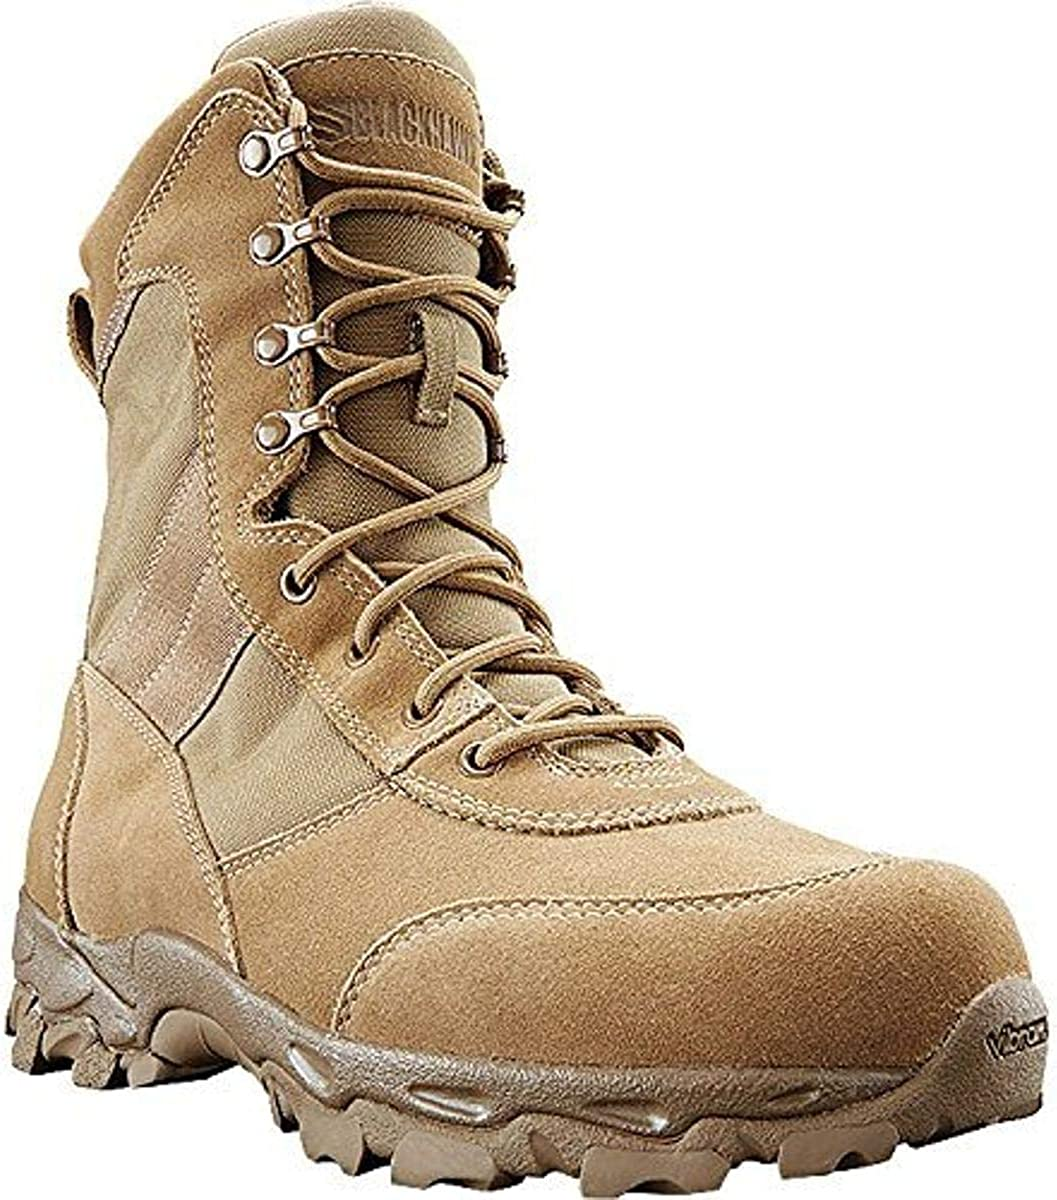 BLACKHAWK BT05CY10M Desert Ops Coyote 498 Boots, Coyote Tan, Size 10/Medium: Clothing